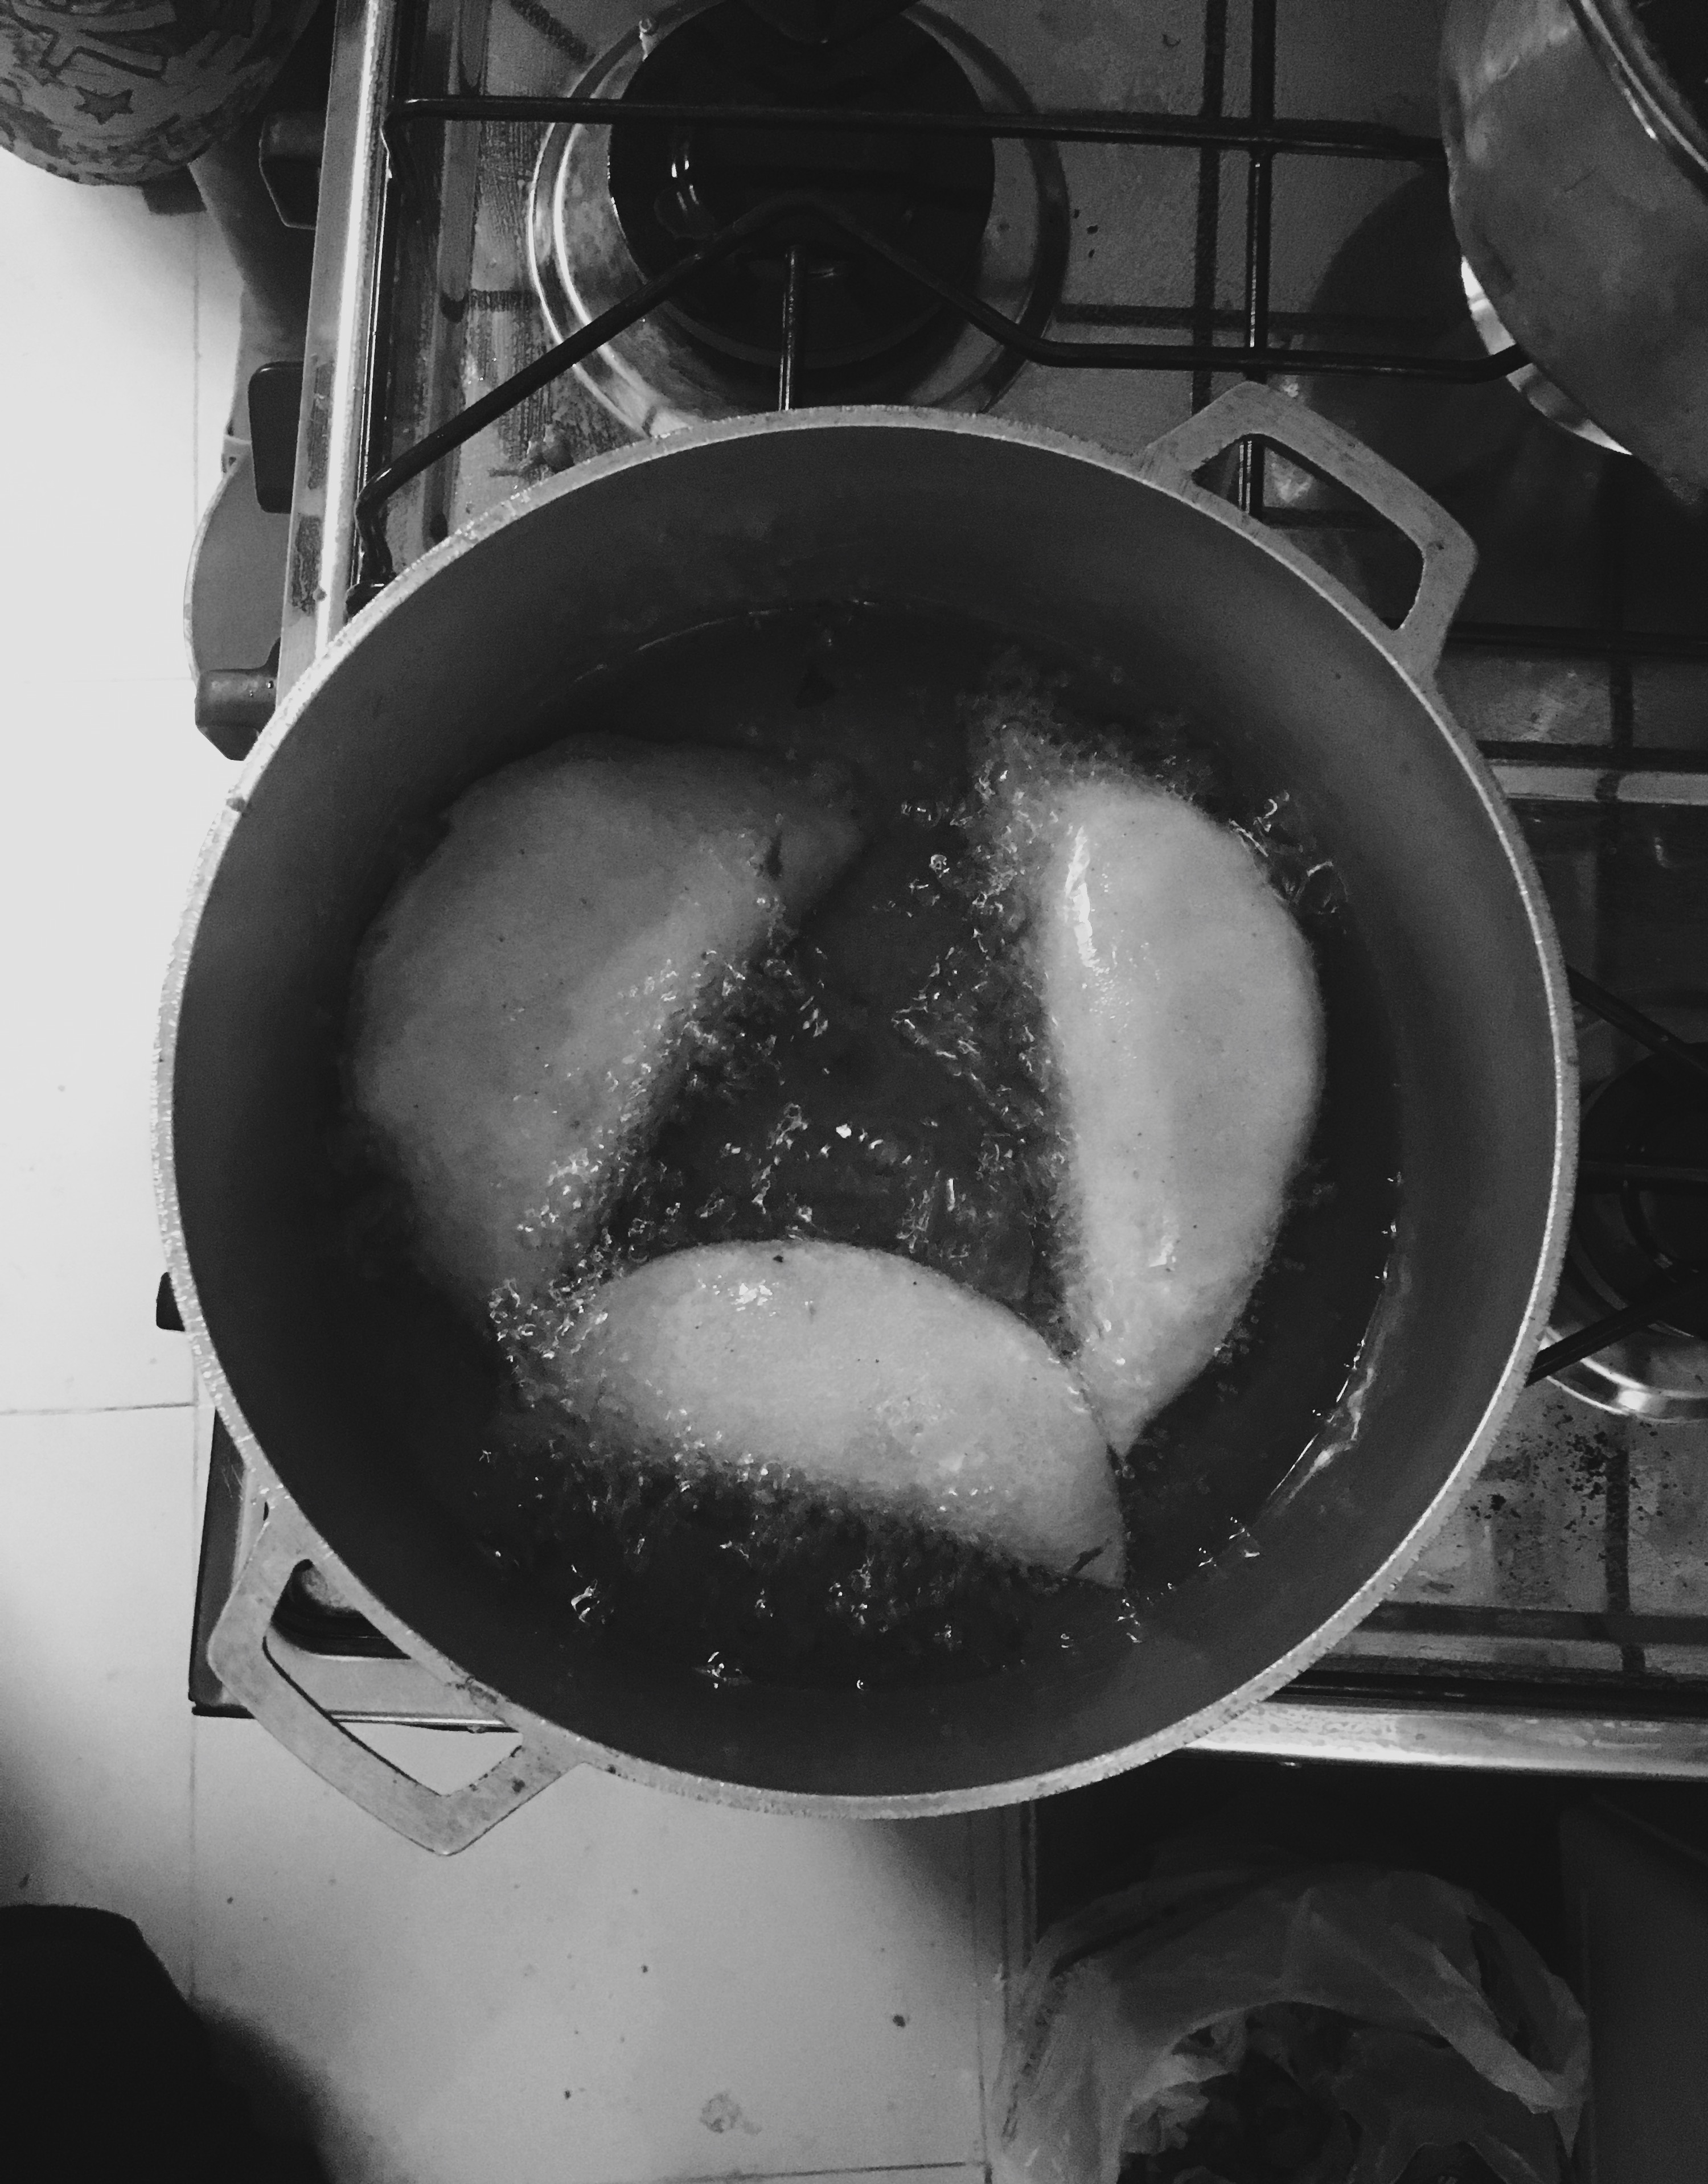 lcm-liveclothesminded-cartagena-colombia-homemade empanadas